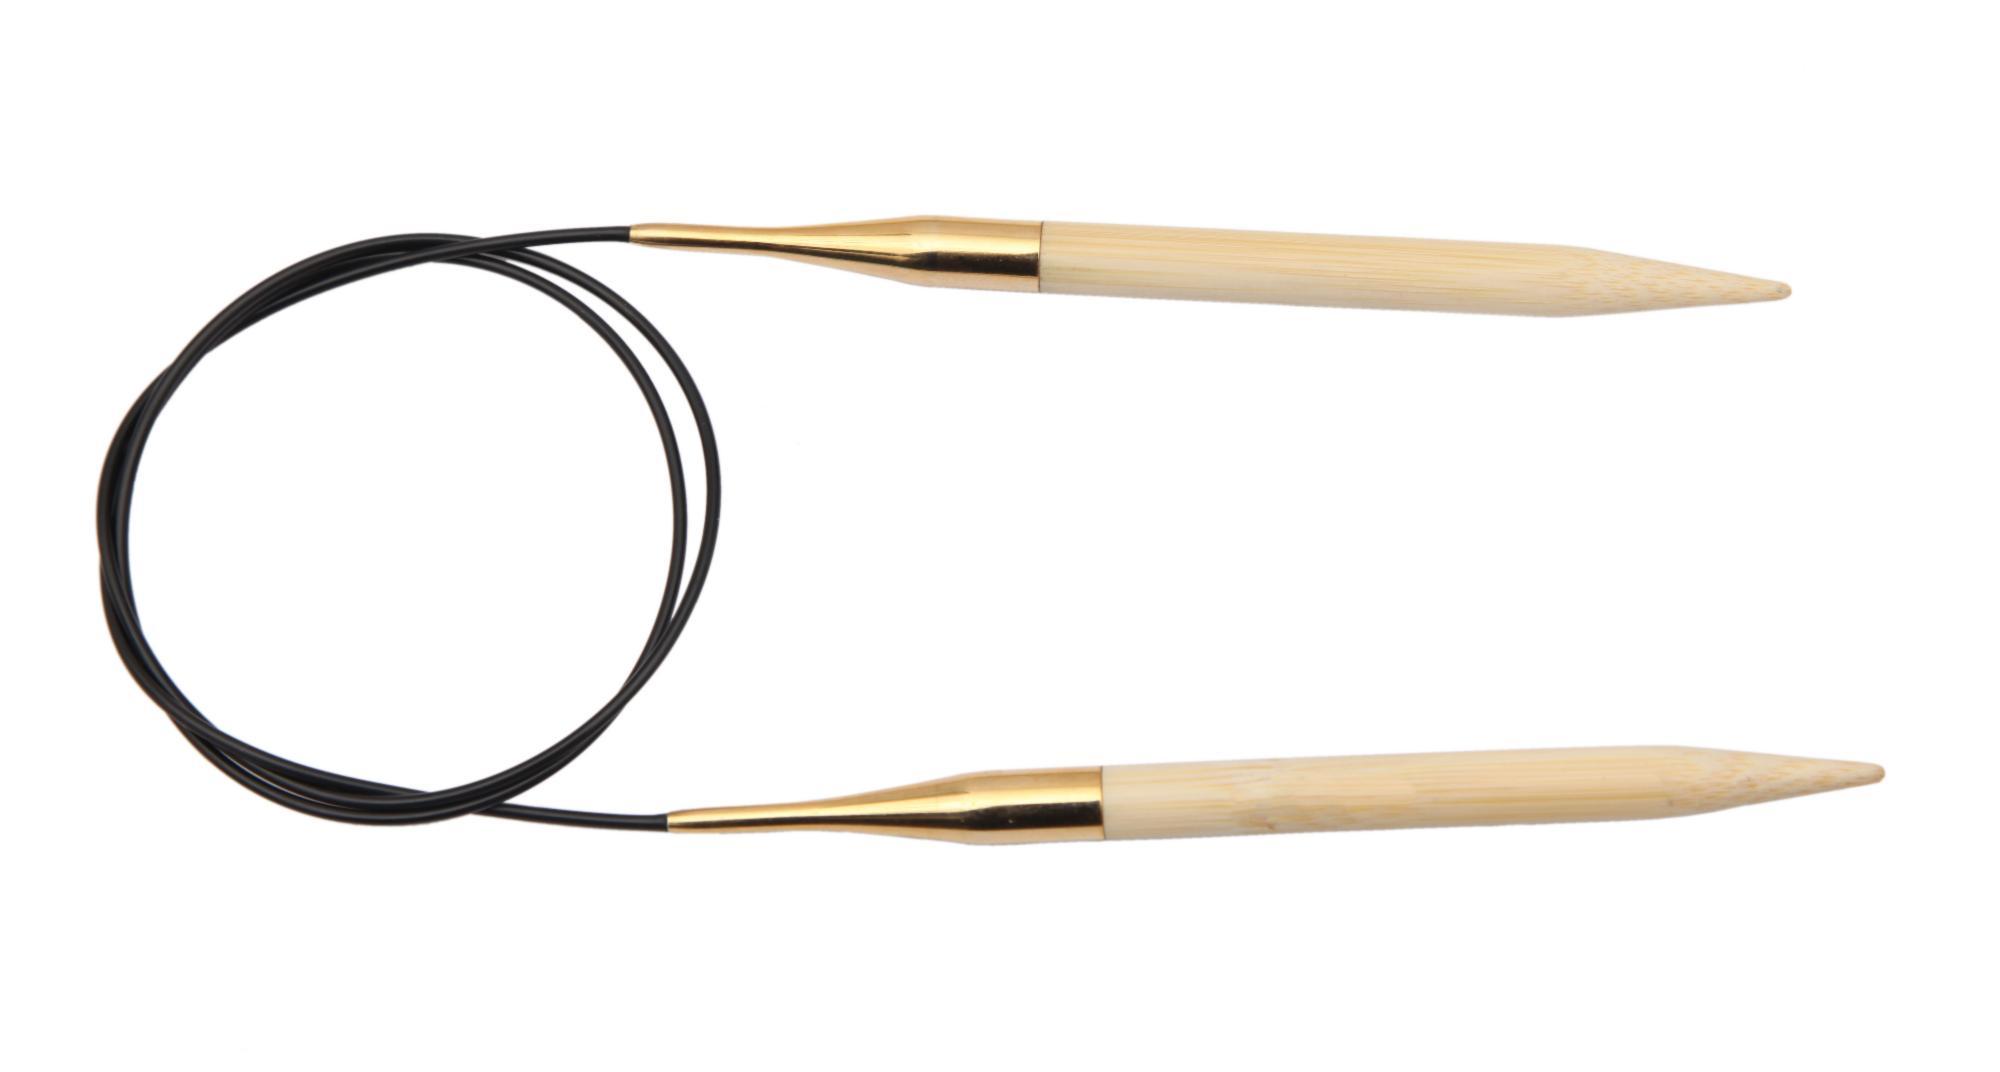 Спицы круговые 100 см Bamboo KnitPro, 22262, 2.25 мм